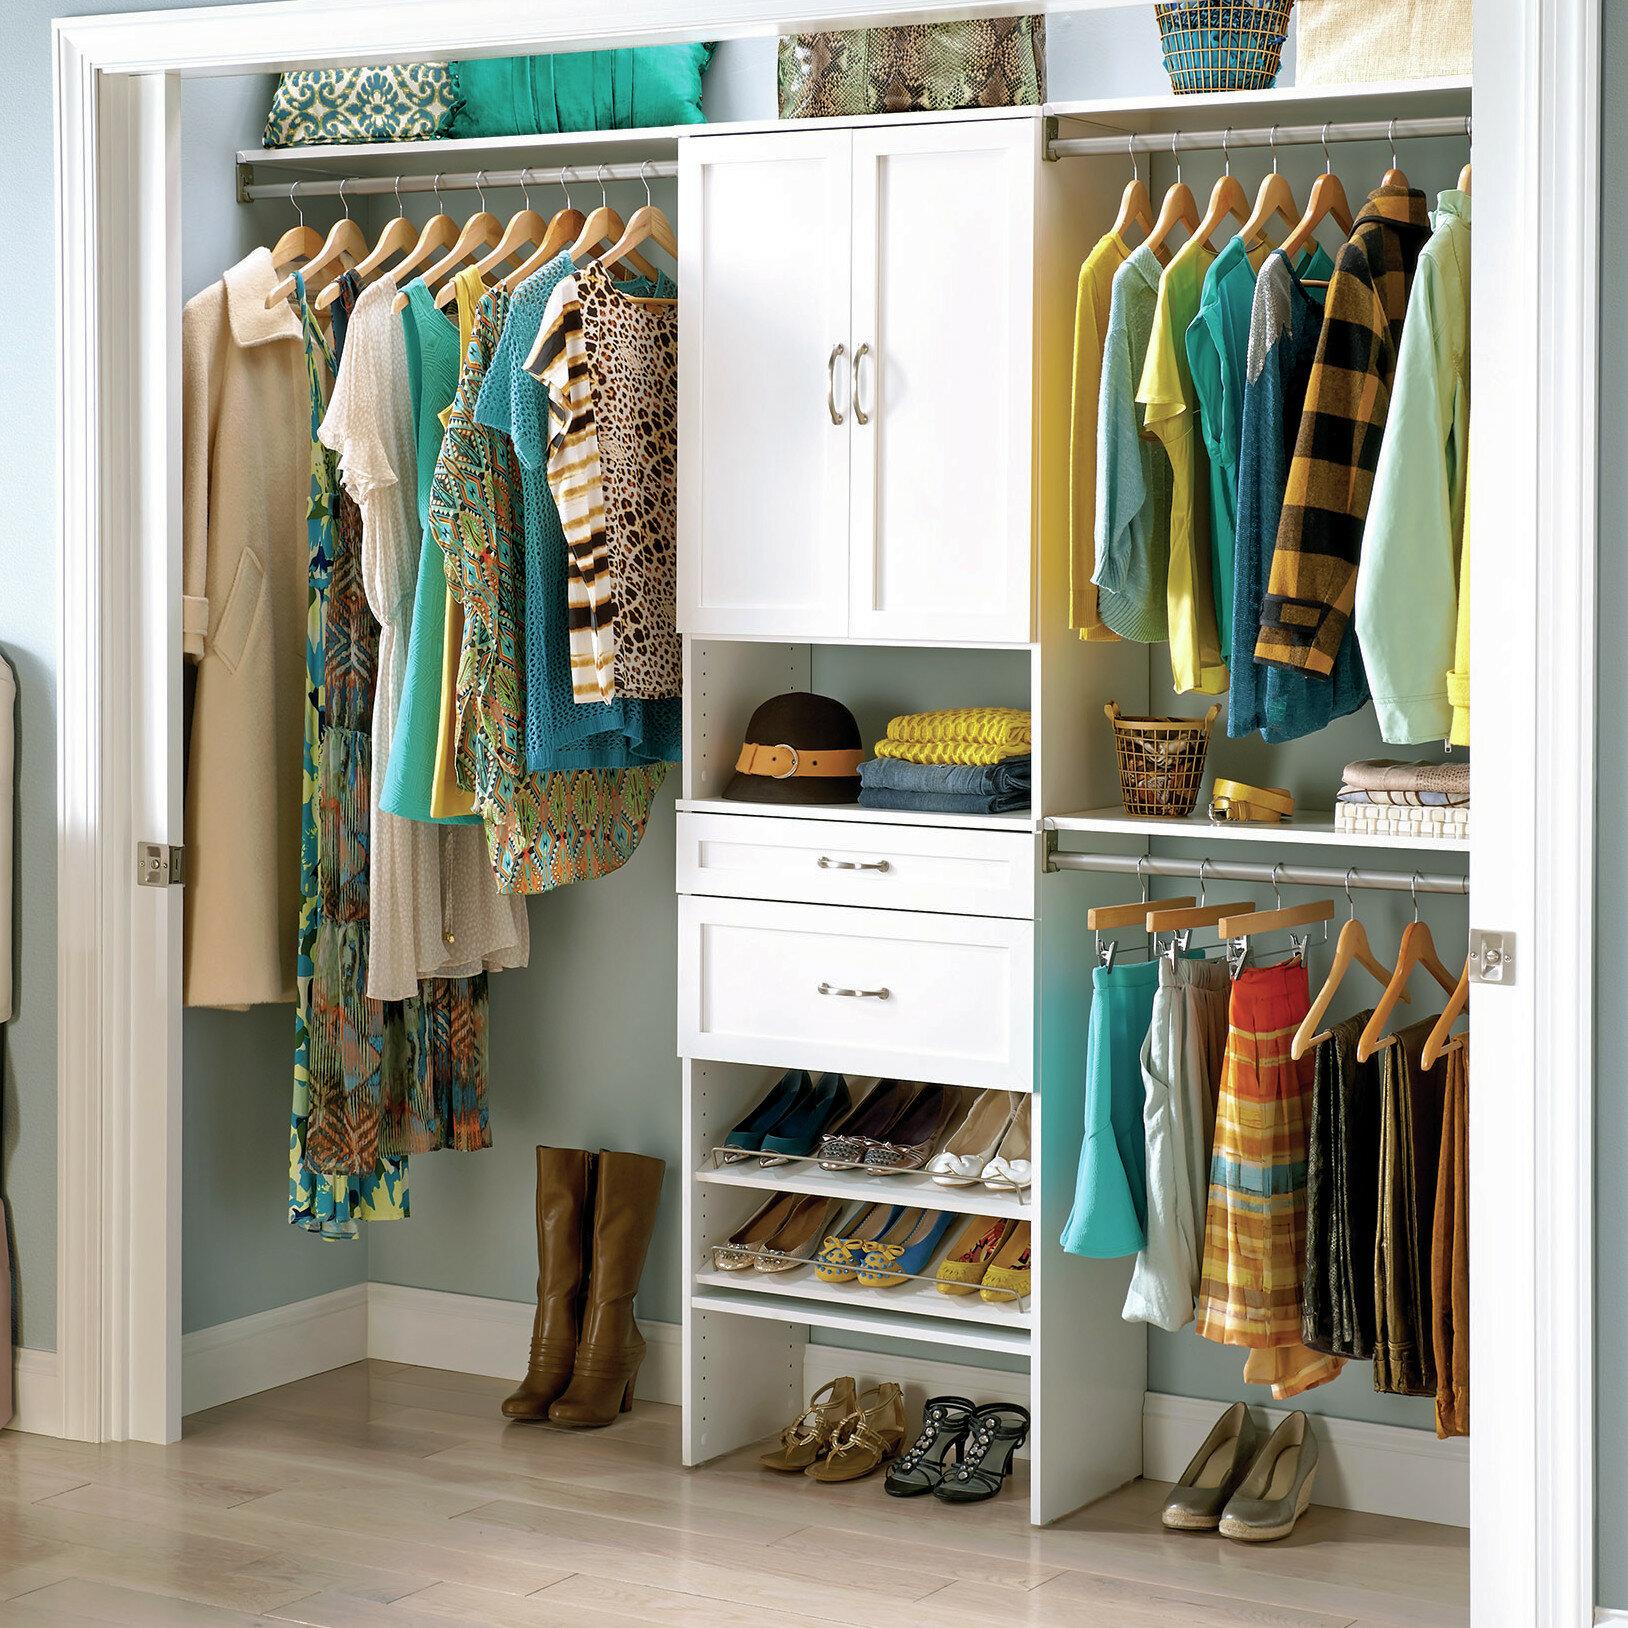 ft shelftrack product organizer hayneedle closet closetmaid detail kit cfm system